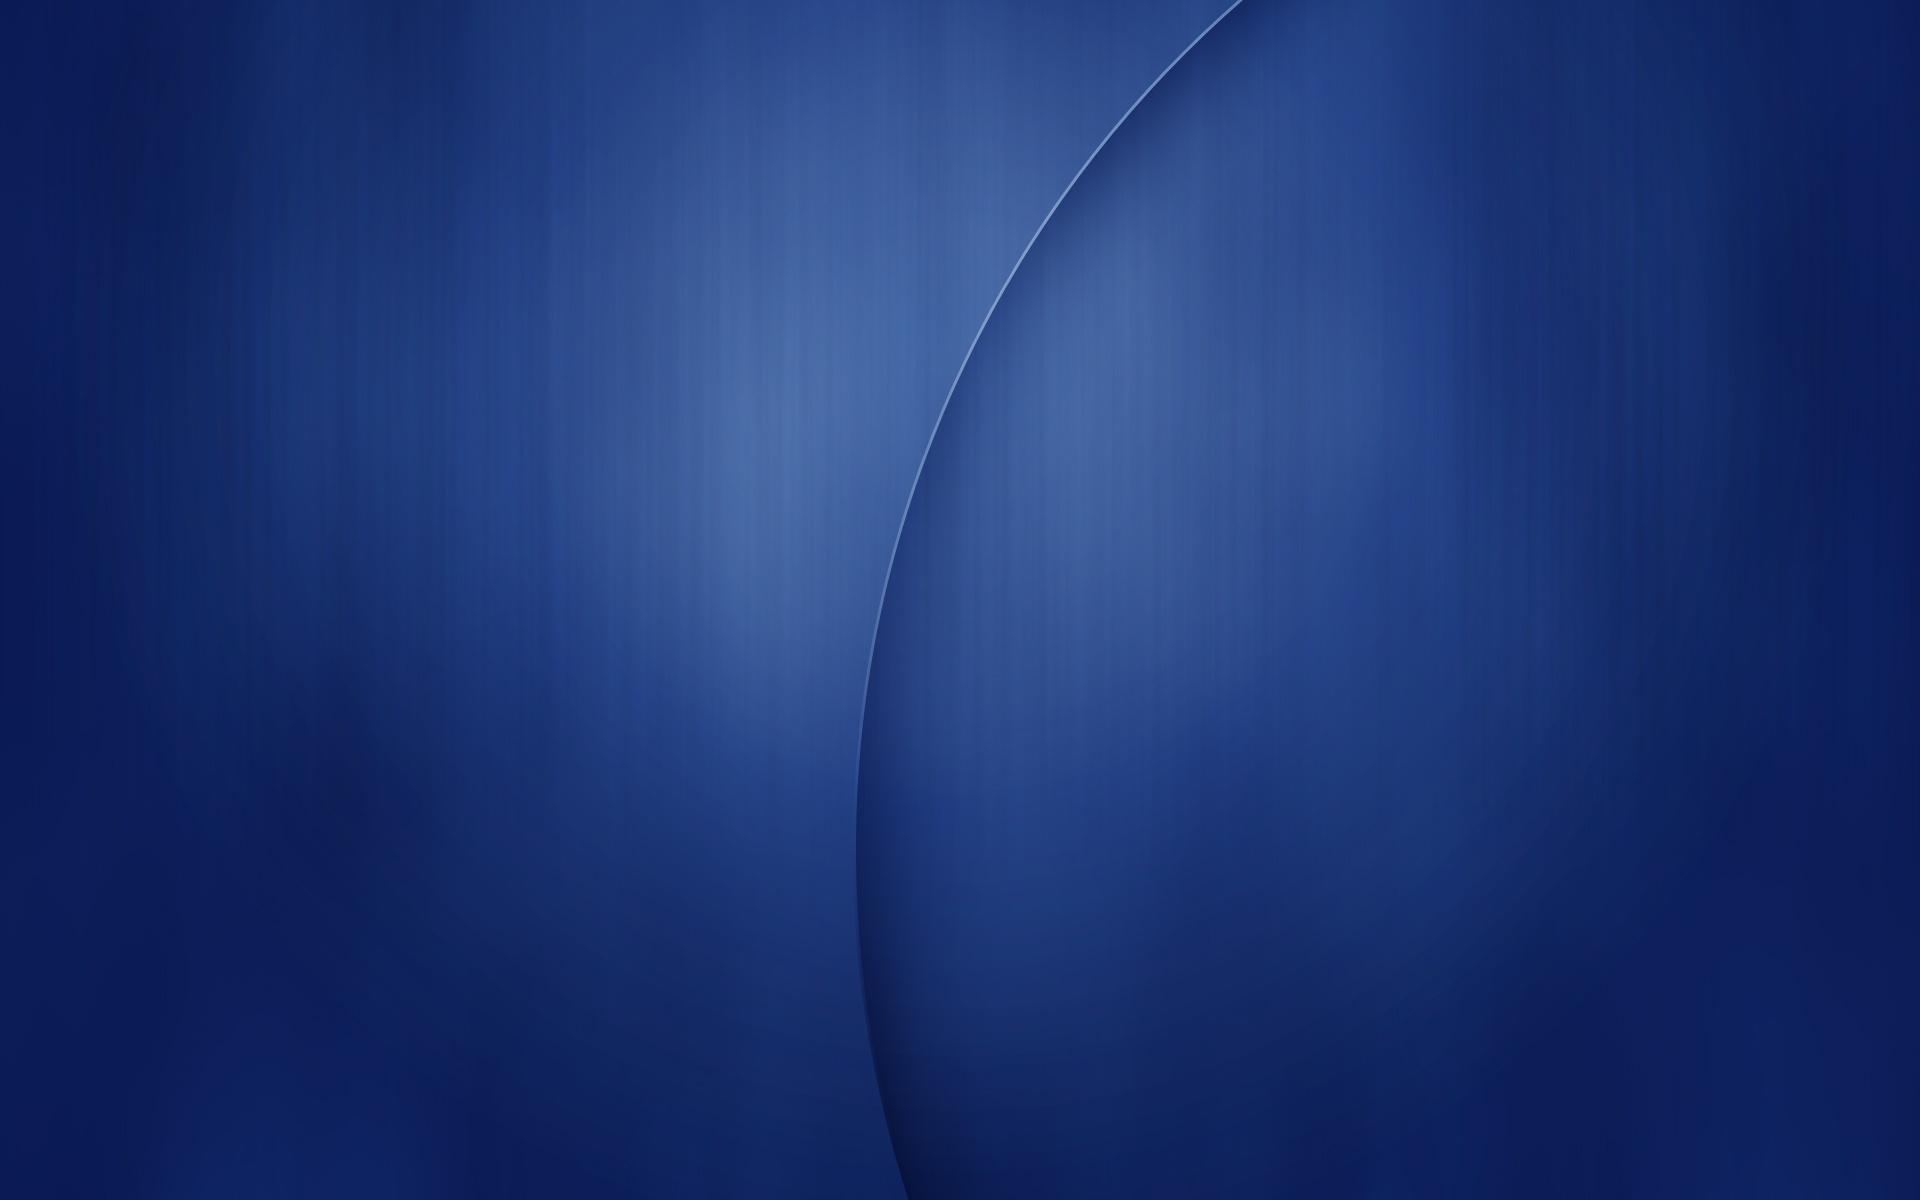 hd wallpapers html filesize x1600 hot wallpapers hd 2560 1600 1920x1200